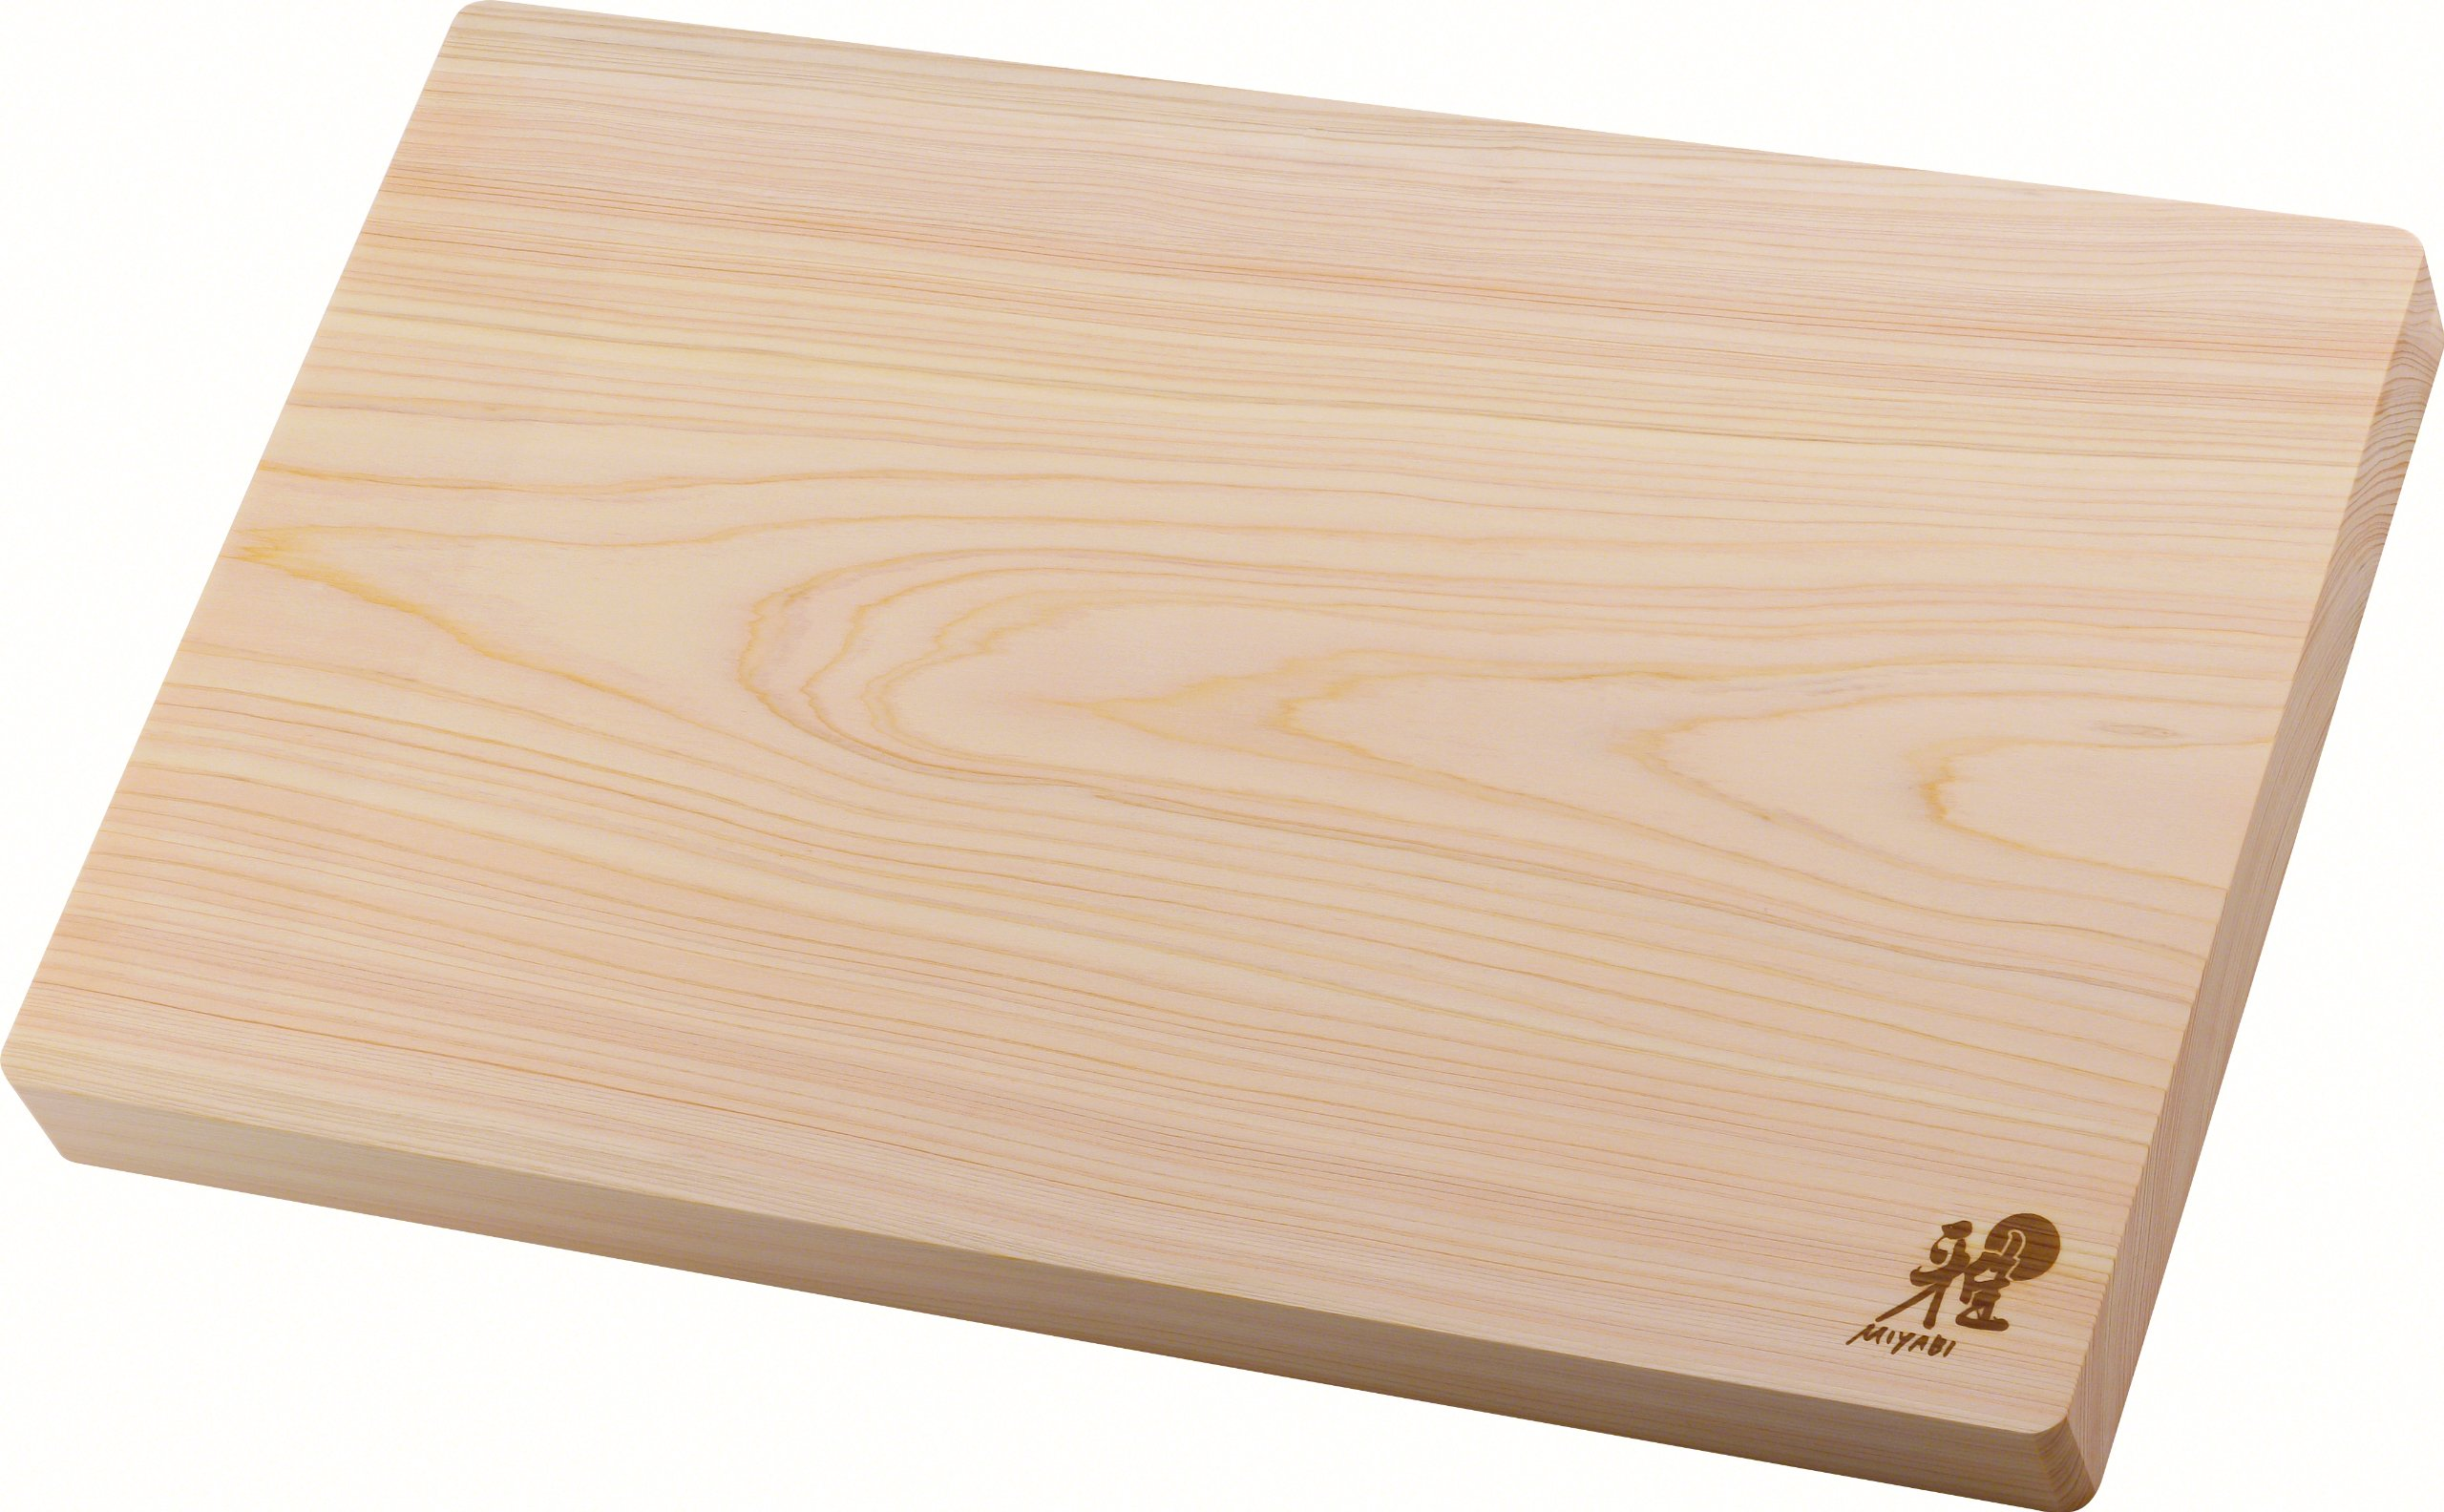 Miyabi 34535-300 Chopping Board 40 x 25 cm Hinoki Wood